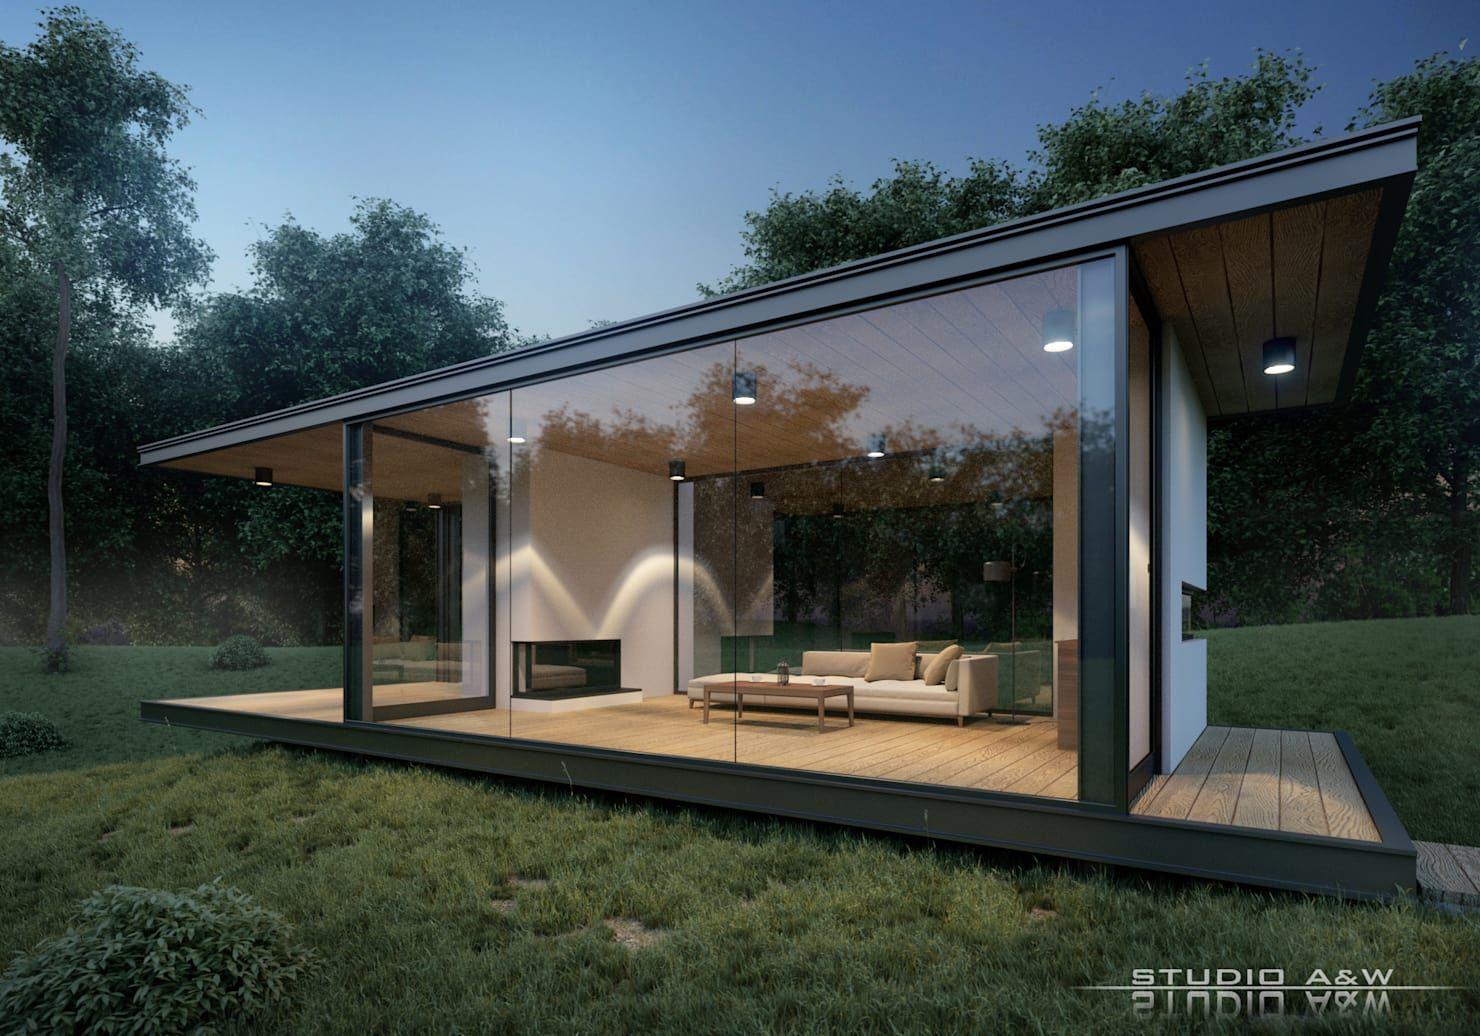 Modernes Gartenhaus in transparentem Design Gartenhaus